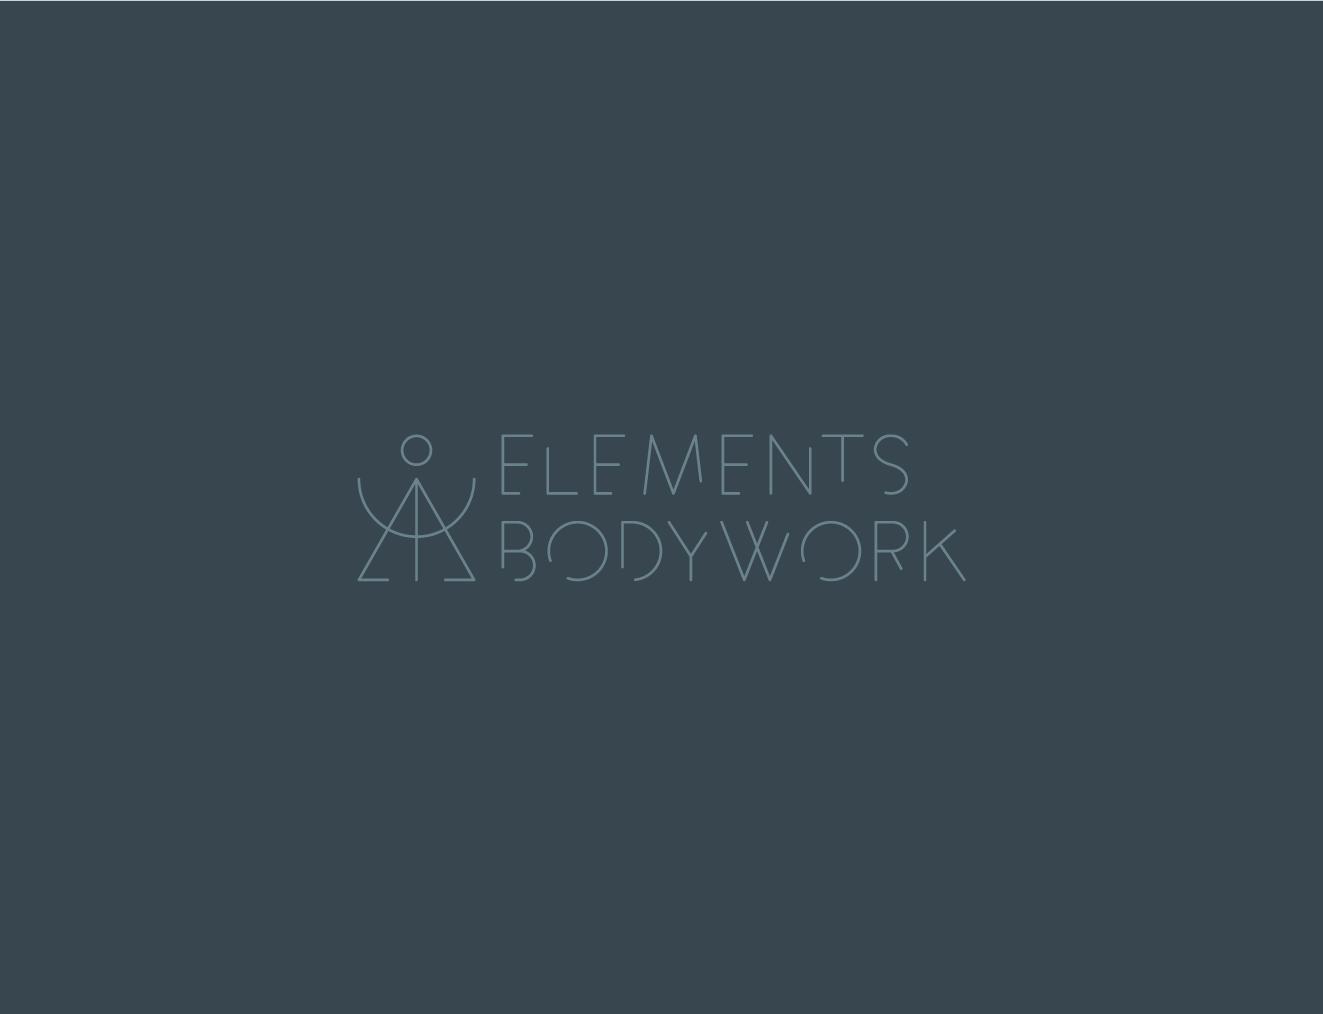 elements-bodywork-dark-grey